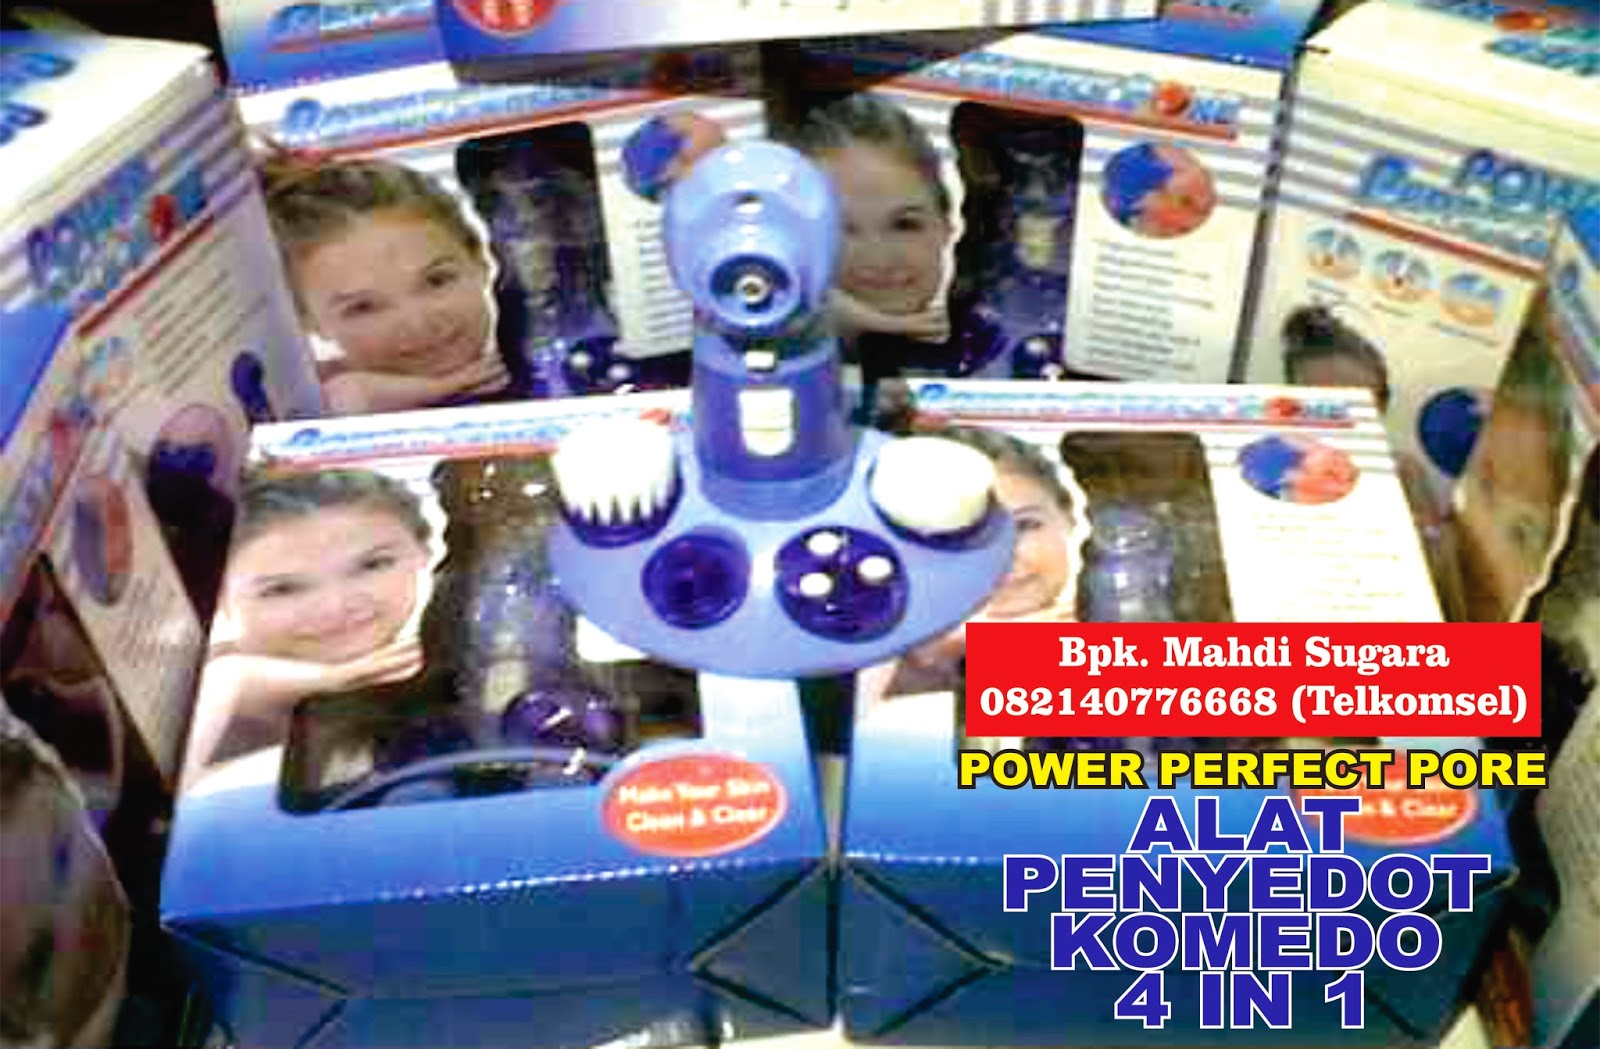 Lapak Olx 082140776668 Jual Alat Pencabut Bulu Ketiak Sedot Komedo 4 In 1 Power Perfect Pore Facial Cleanser Call Sms